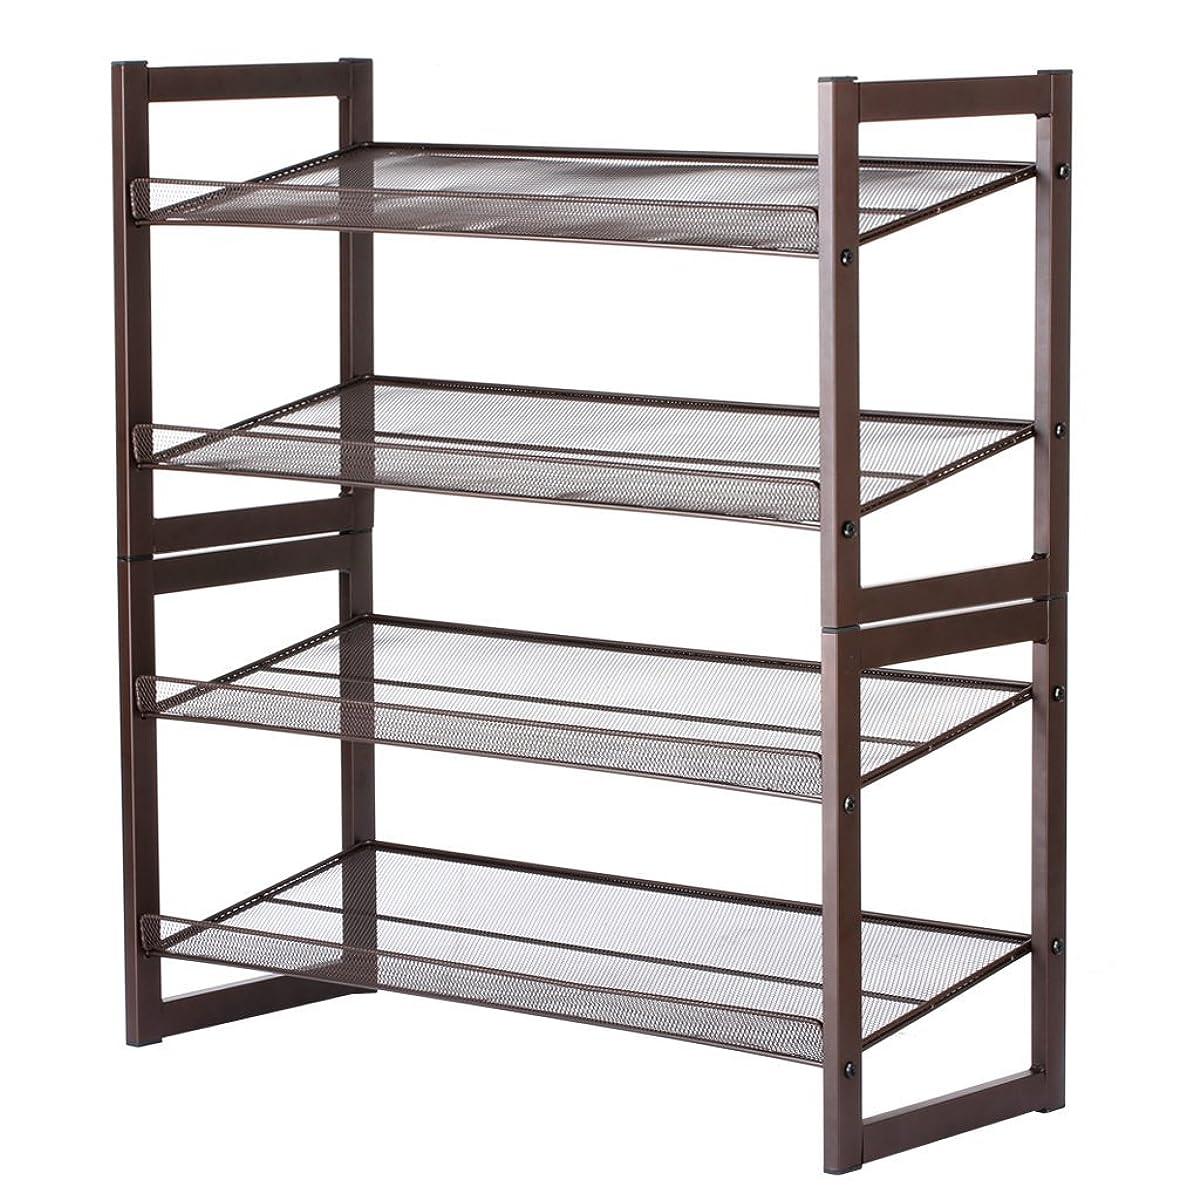 Rackaphile 4-Tier Stackable Metal Shoe Rack Mesh Utility Shoe Storage Organizer Shelf for Closet Bedroom Entryway 32.3